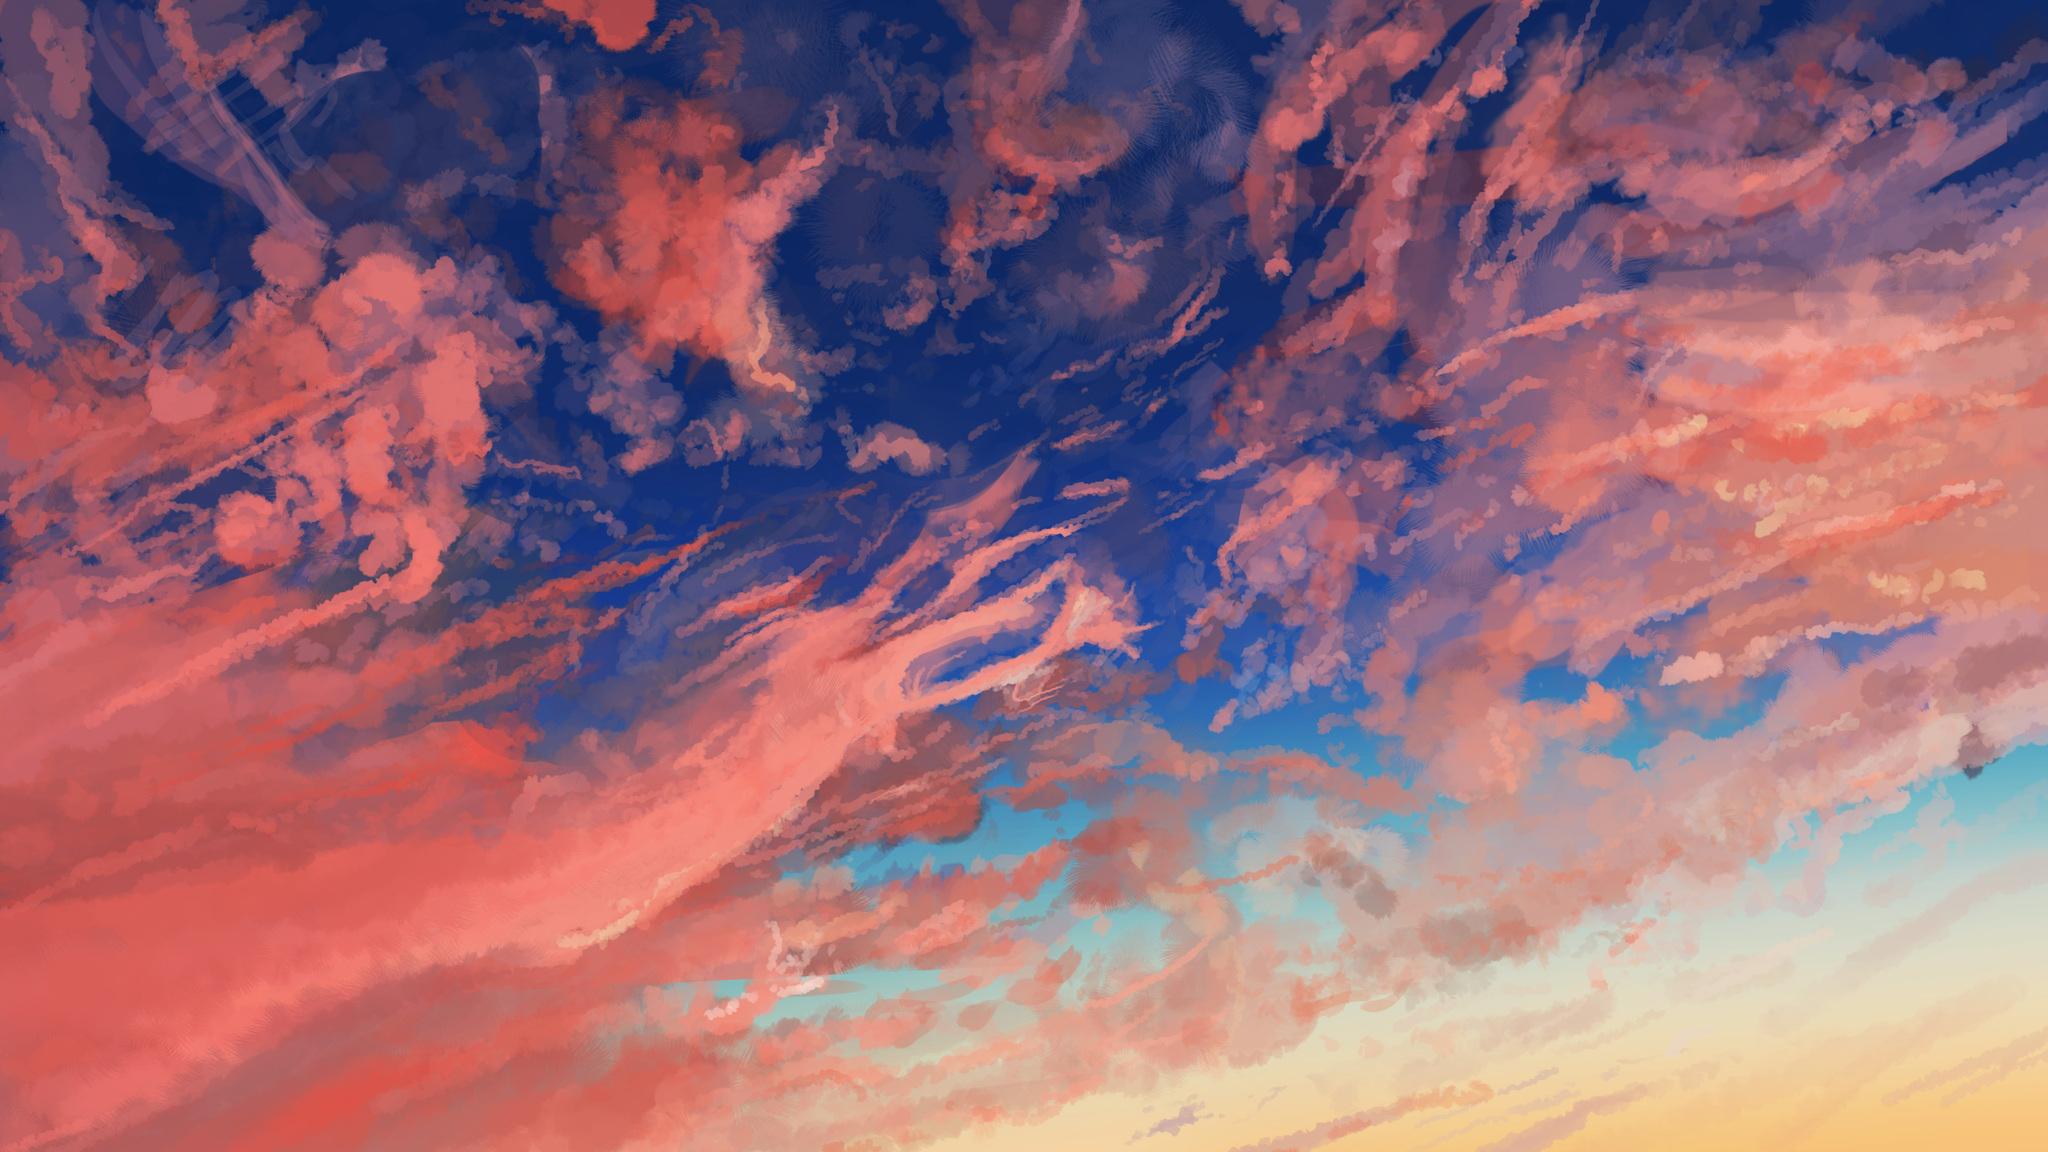 2048x1152 Cloud Sky Anime 2048x1152 Resolution Hd 4k